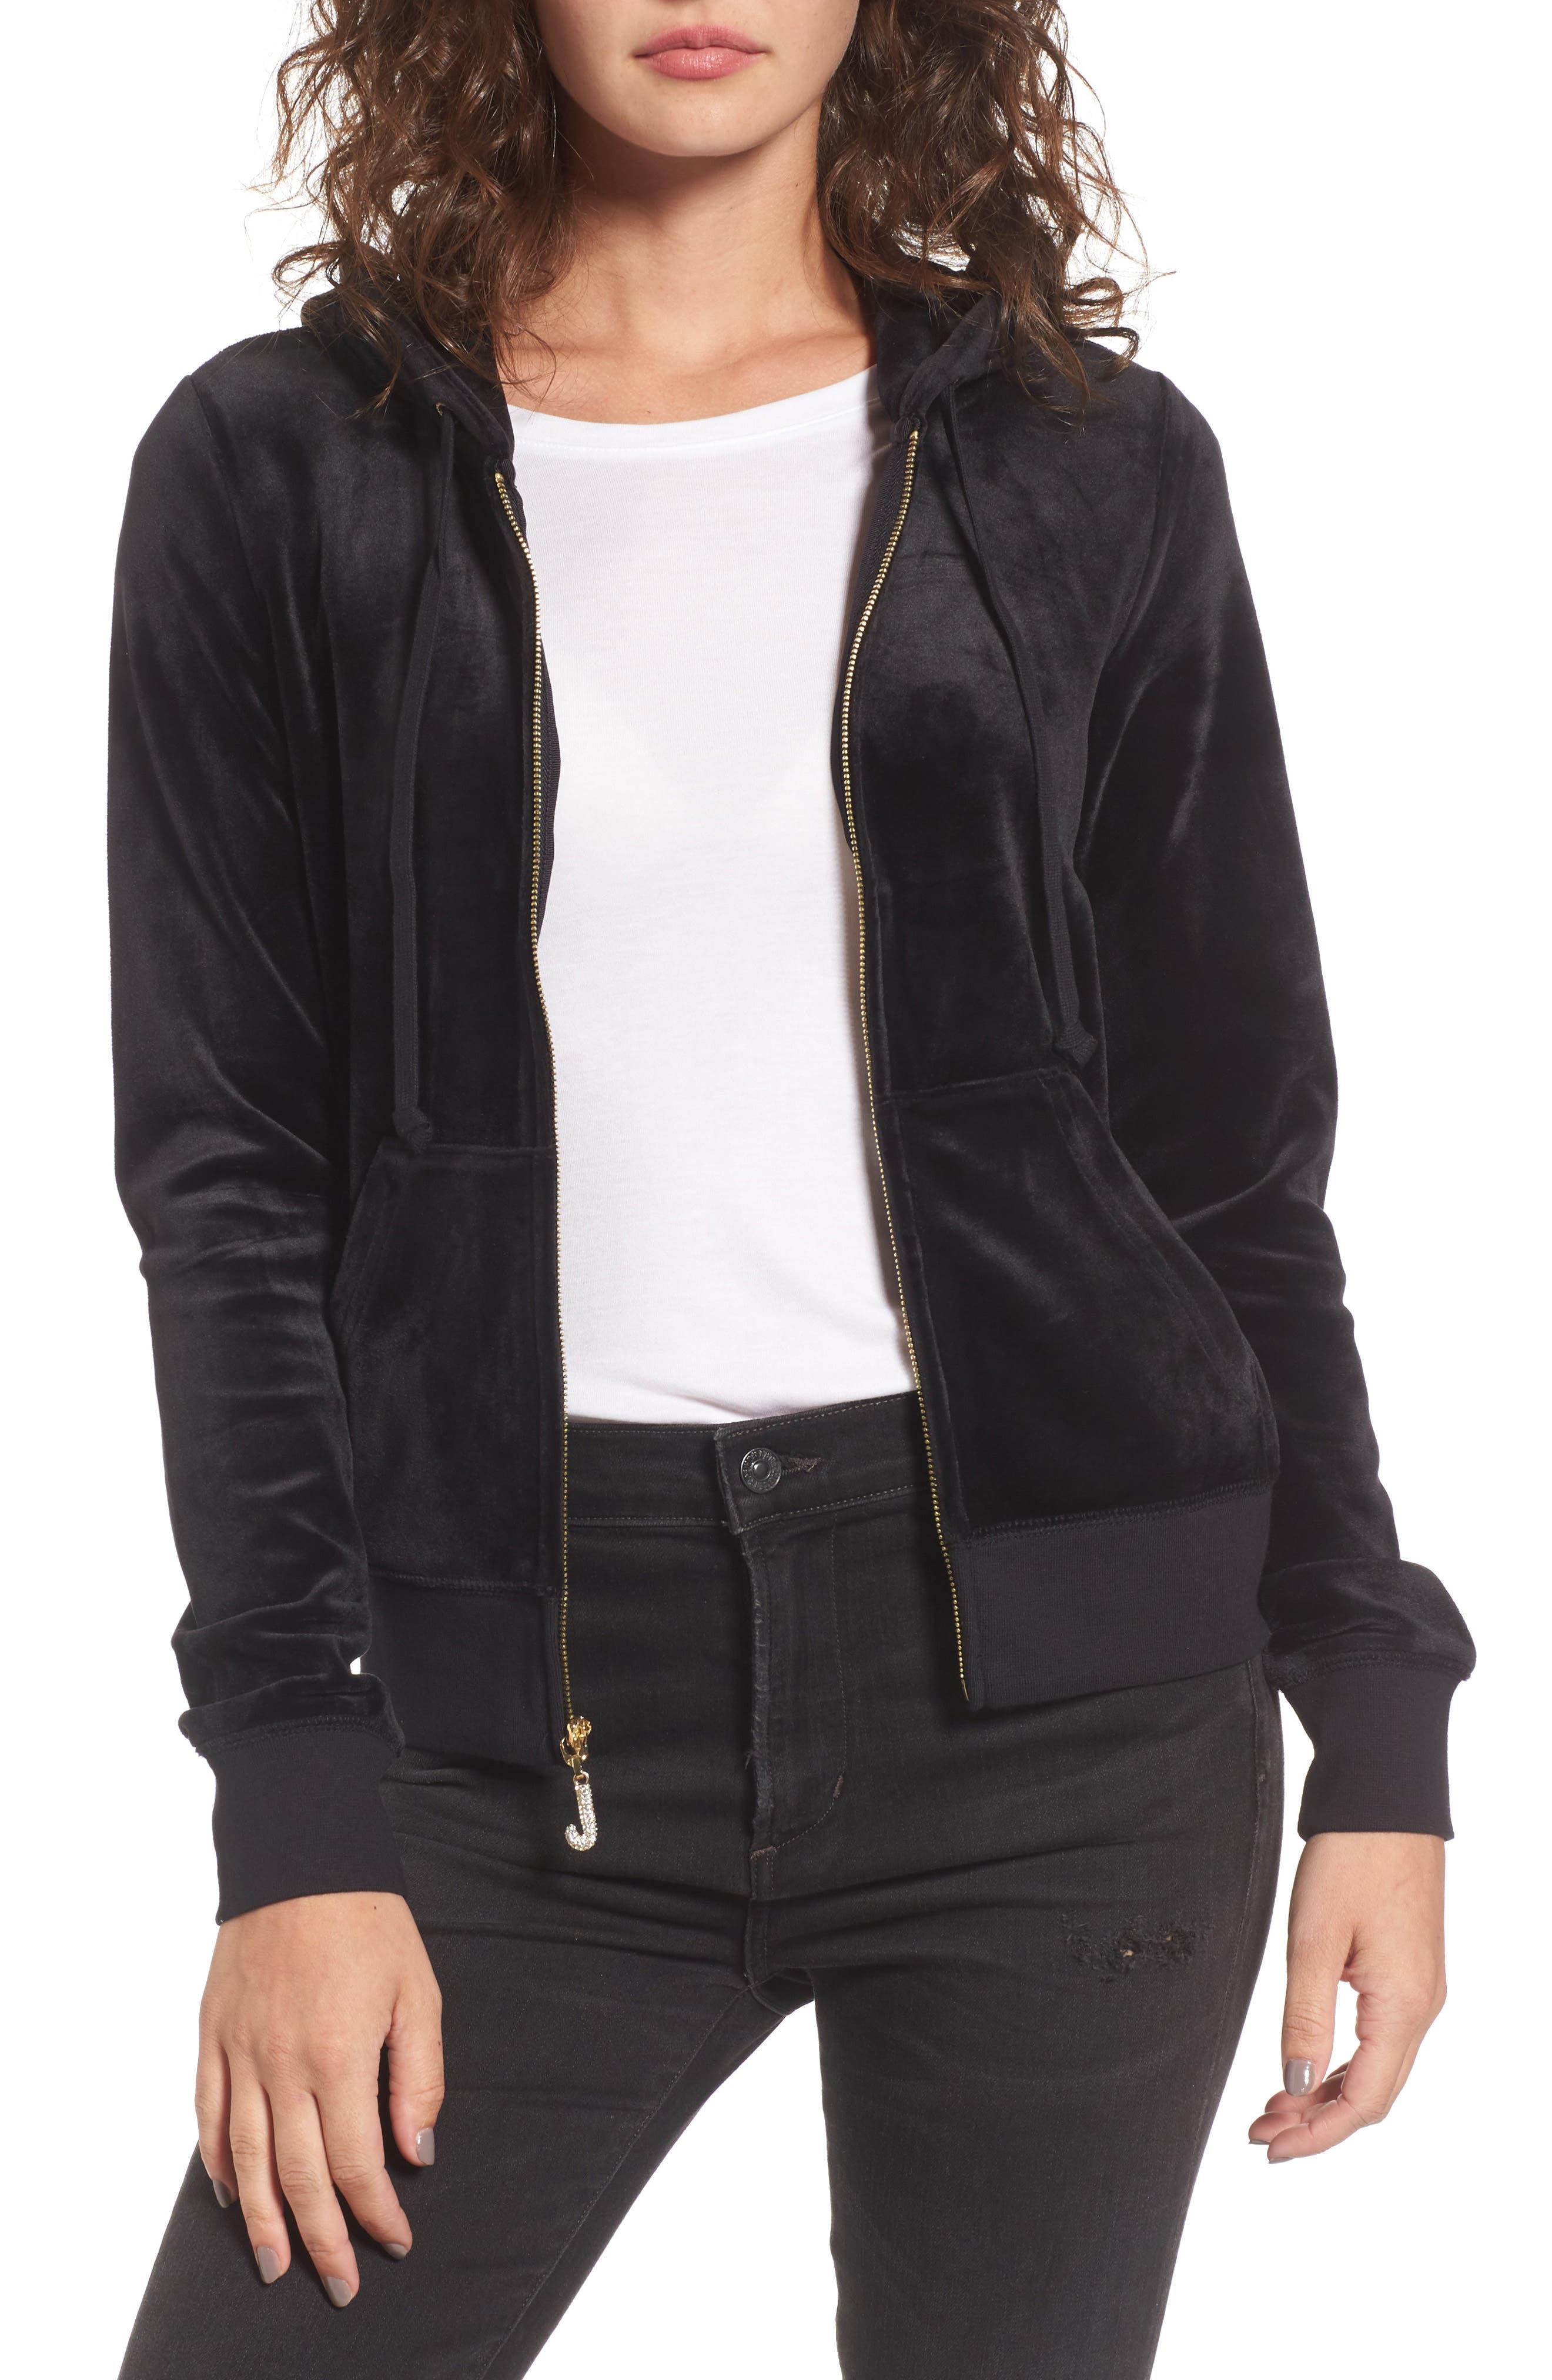 Main Image - Juicy Couture Robertson Ultra Luxe Velour Zip Hoodie